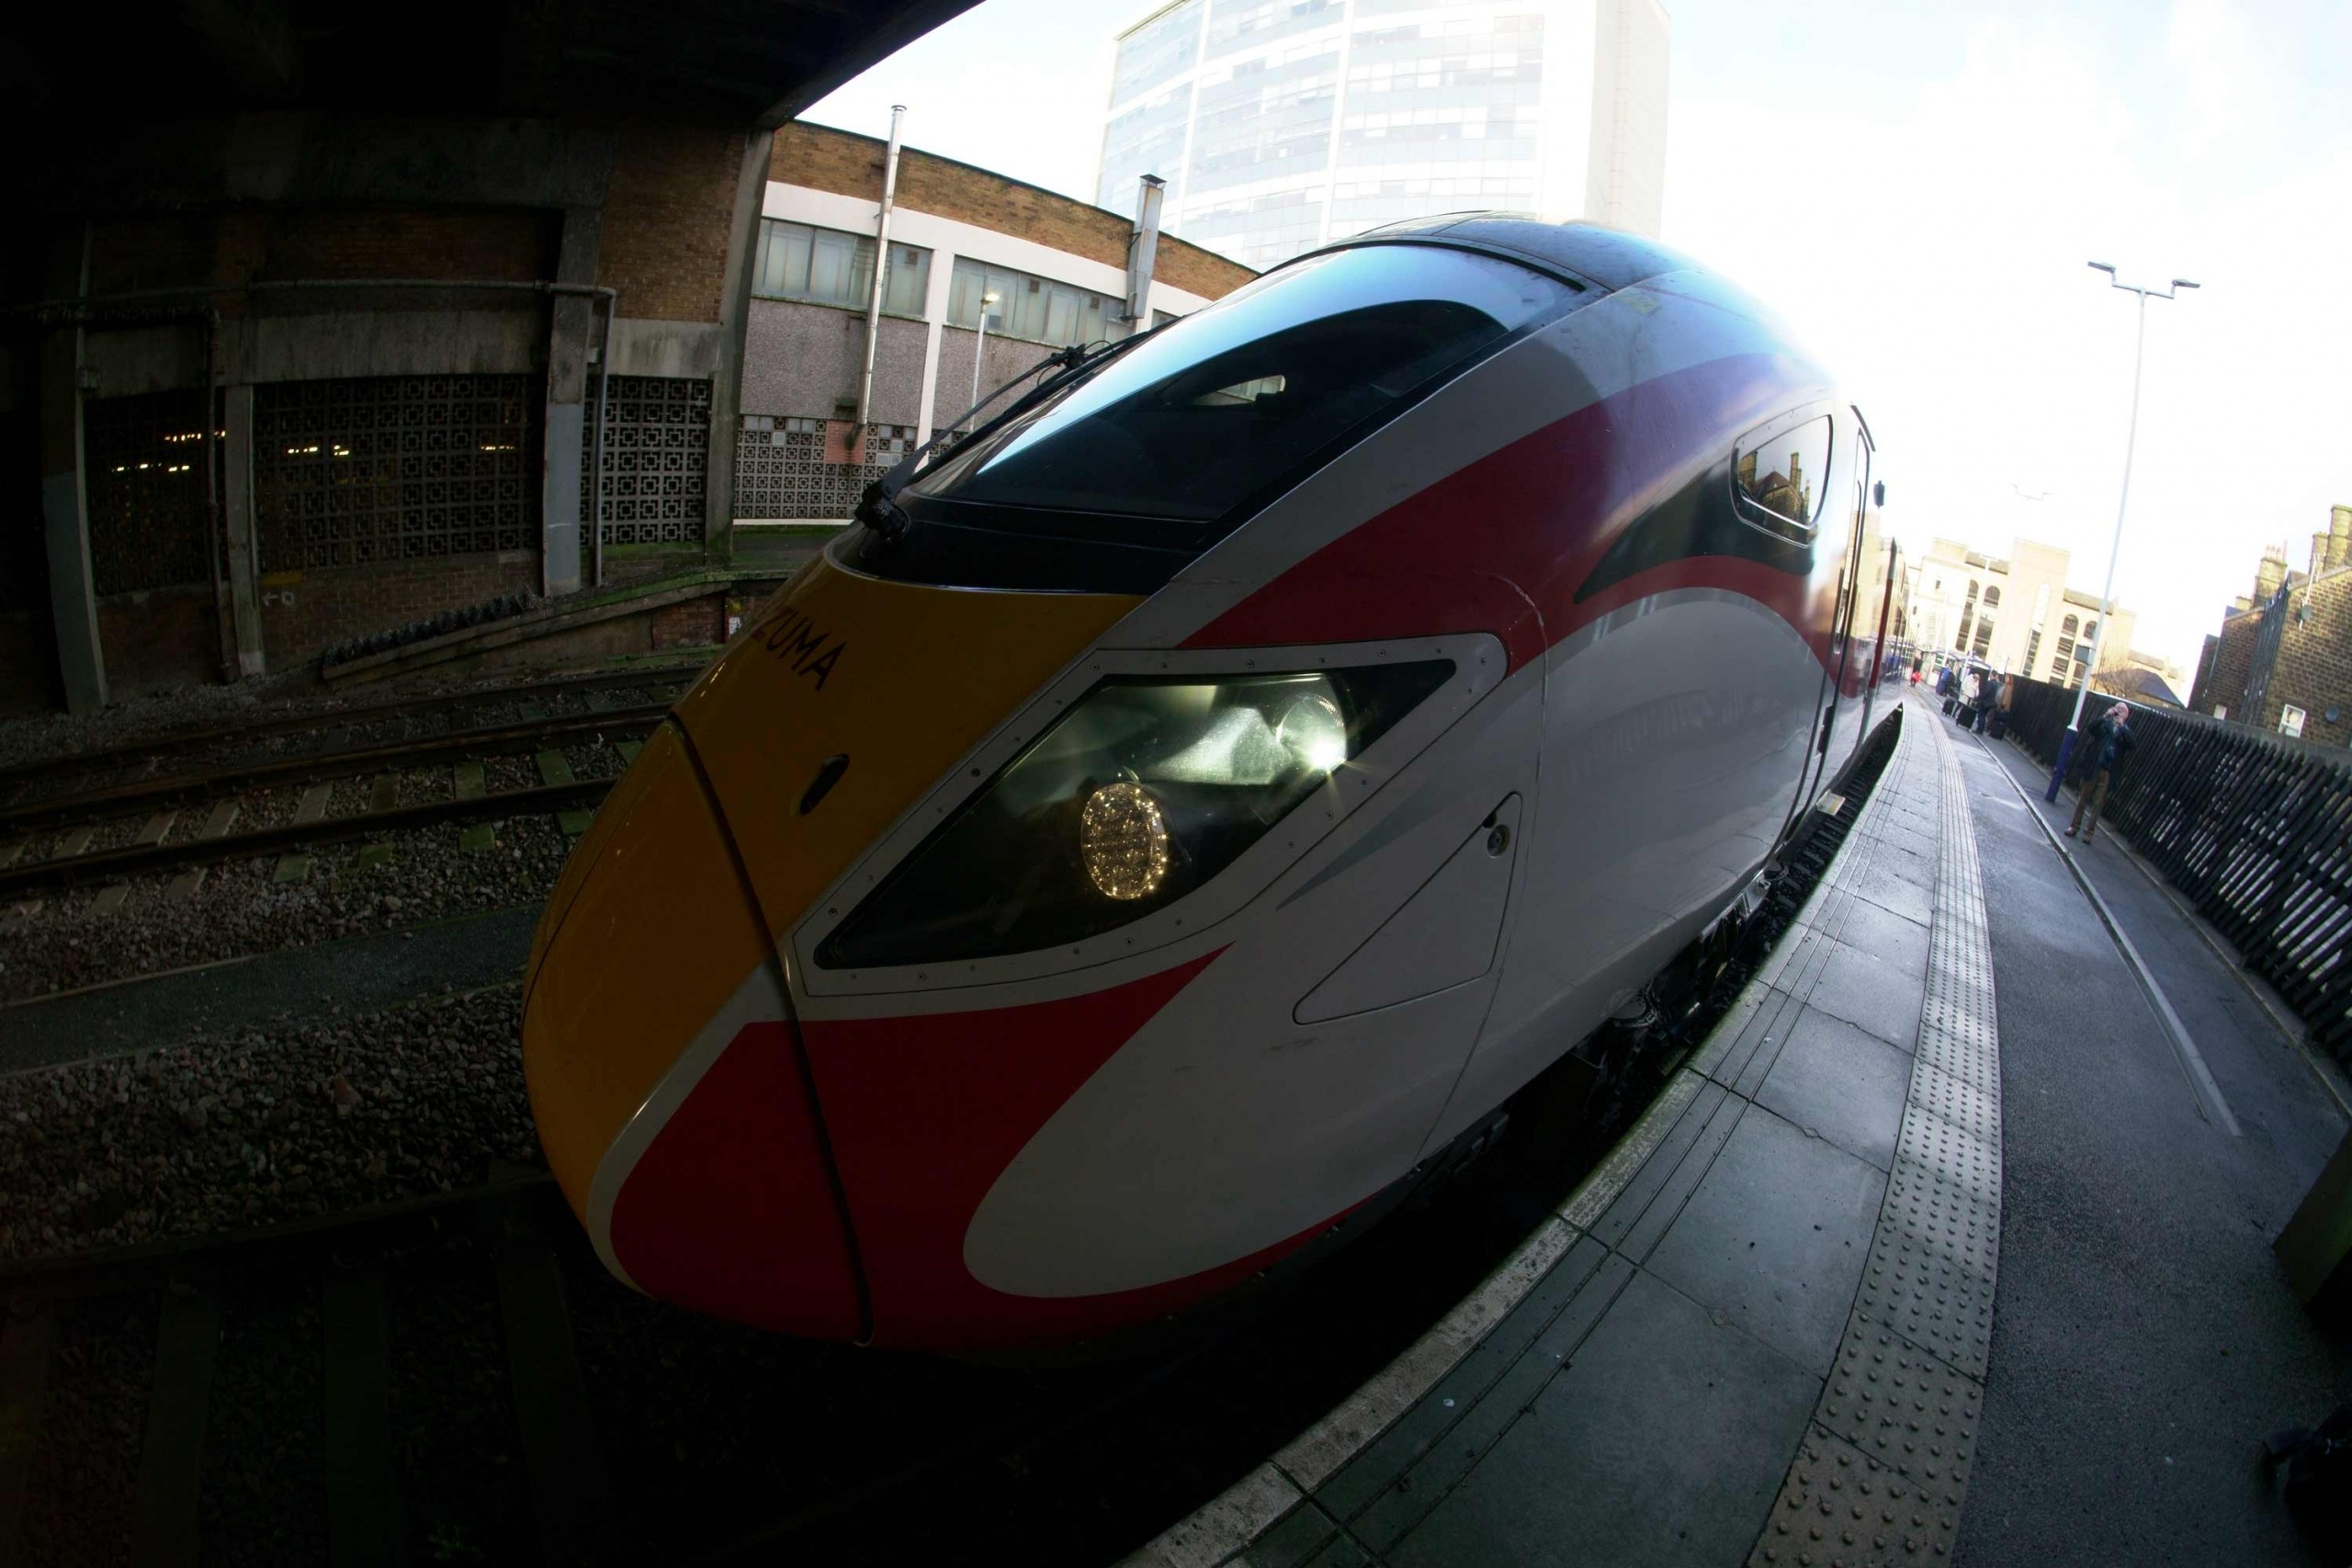 Azuma trains harrogate